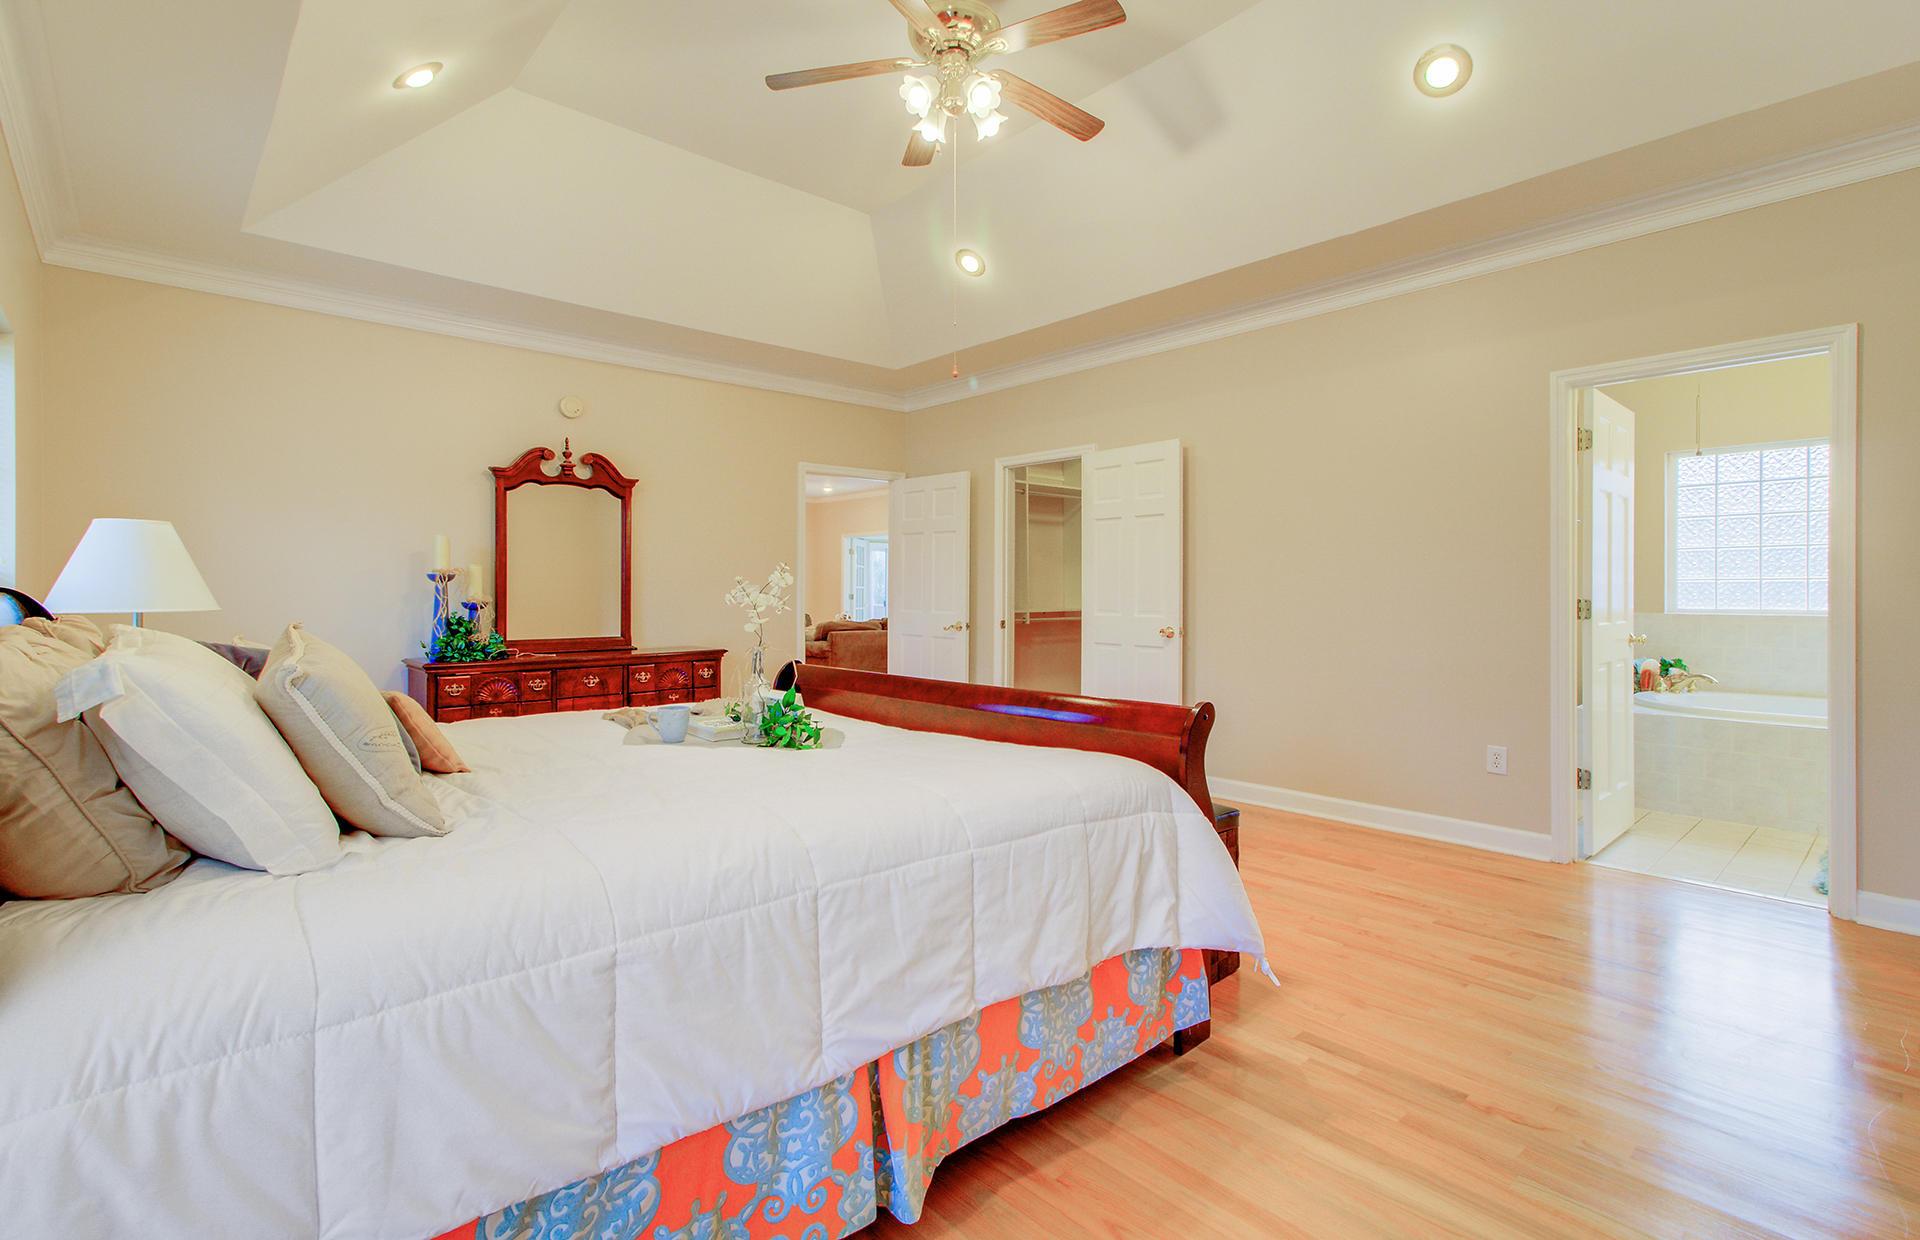 Bakers Landing Homes For Sale - 105 River Oak, North Charleston, SC - 14